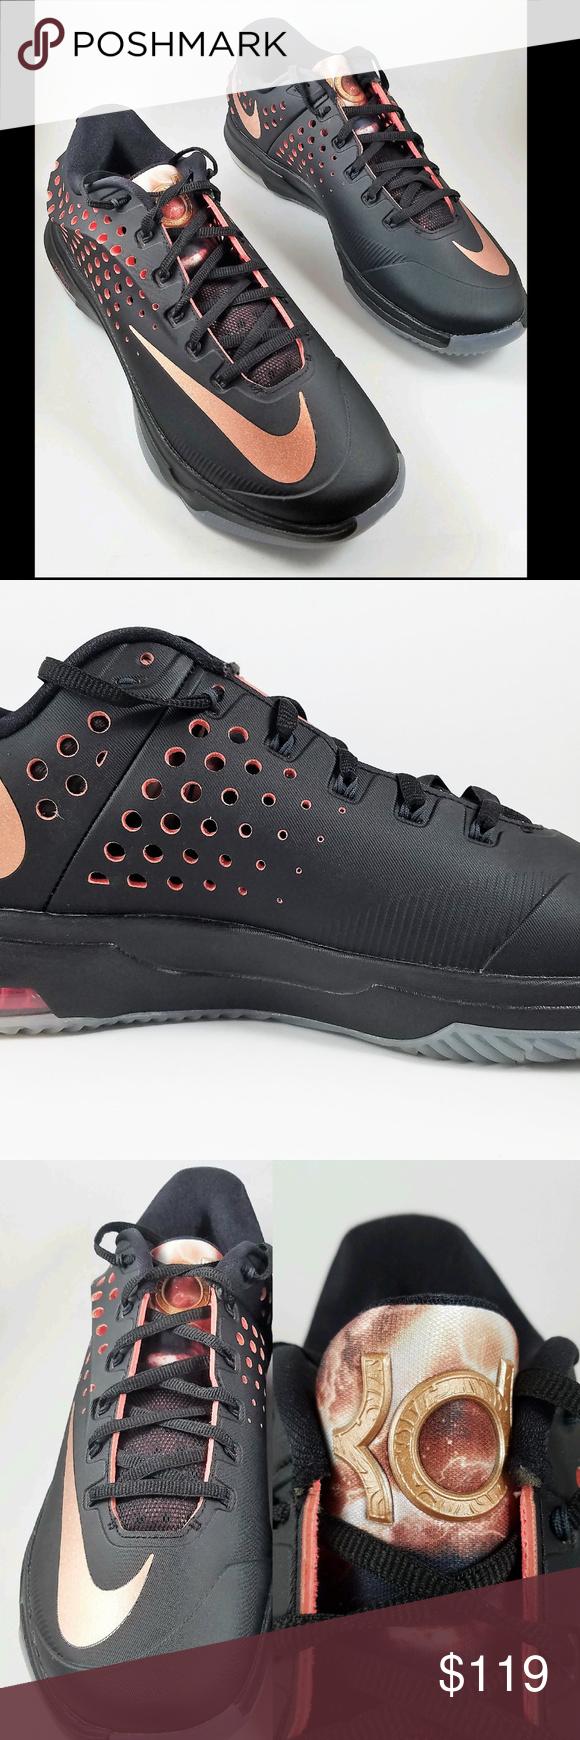 san francisco 088a2 90064 Nike Kevin Durant Basketball Shoe Retro size 9 Red Nike KD VII Elite Sz 9  724349